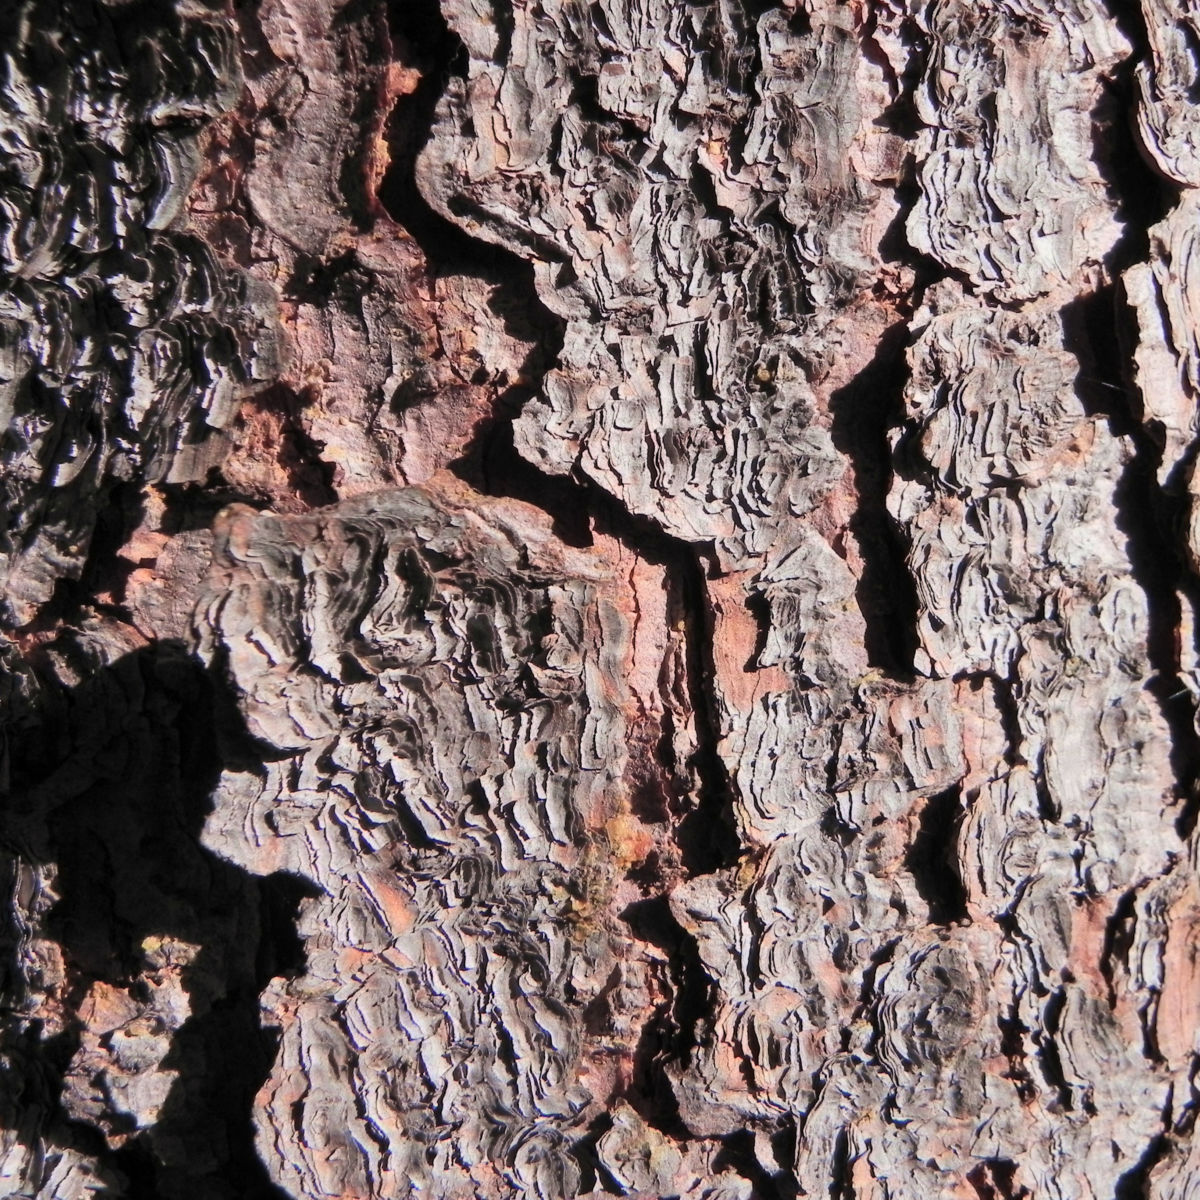 Borsten Fichte Picea asperata